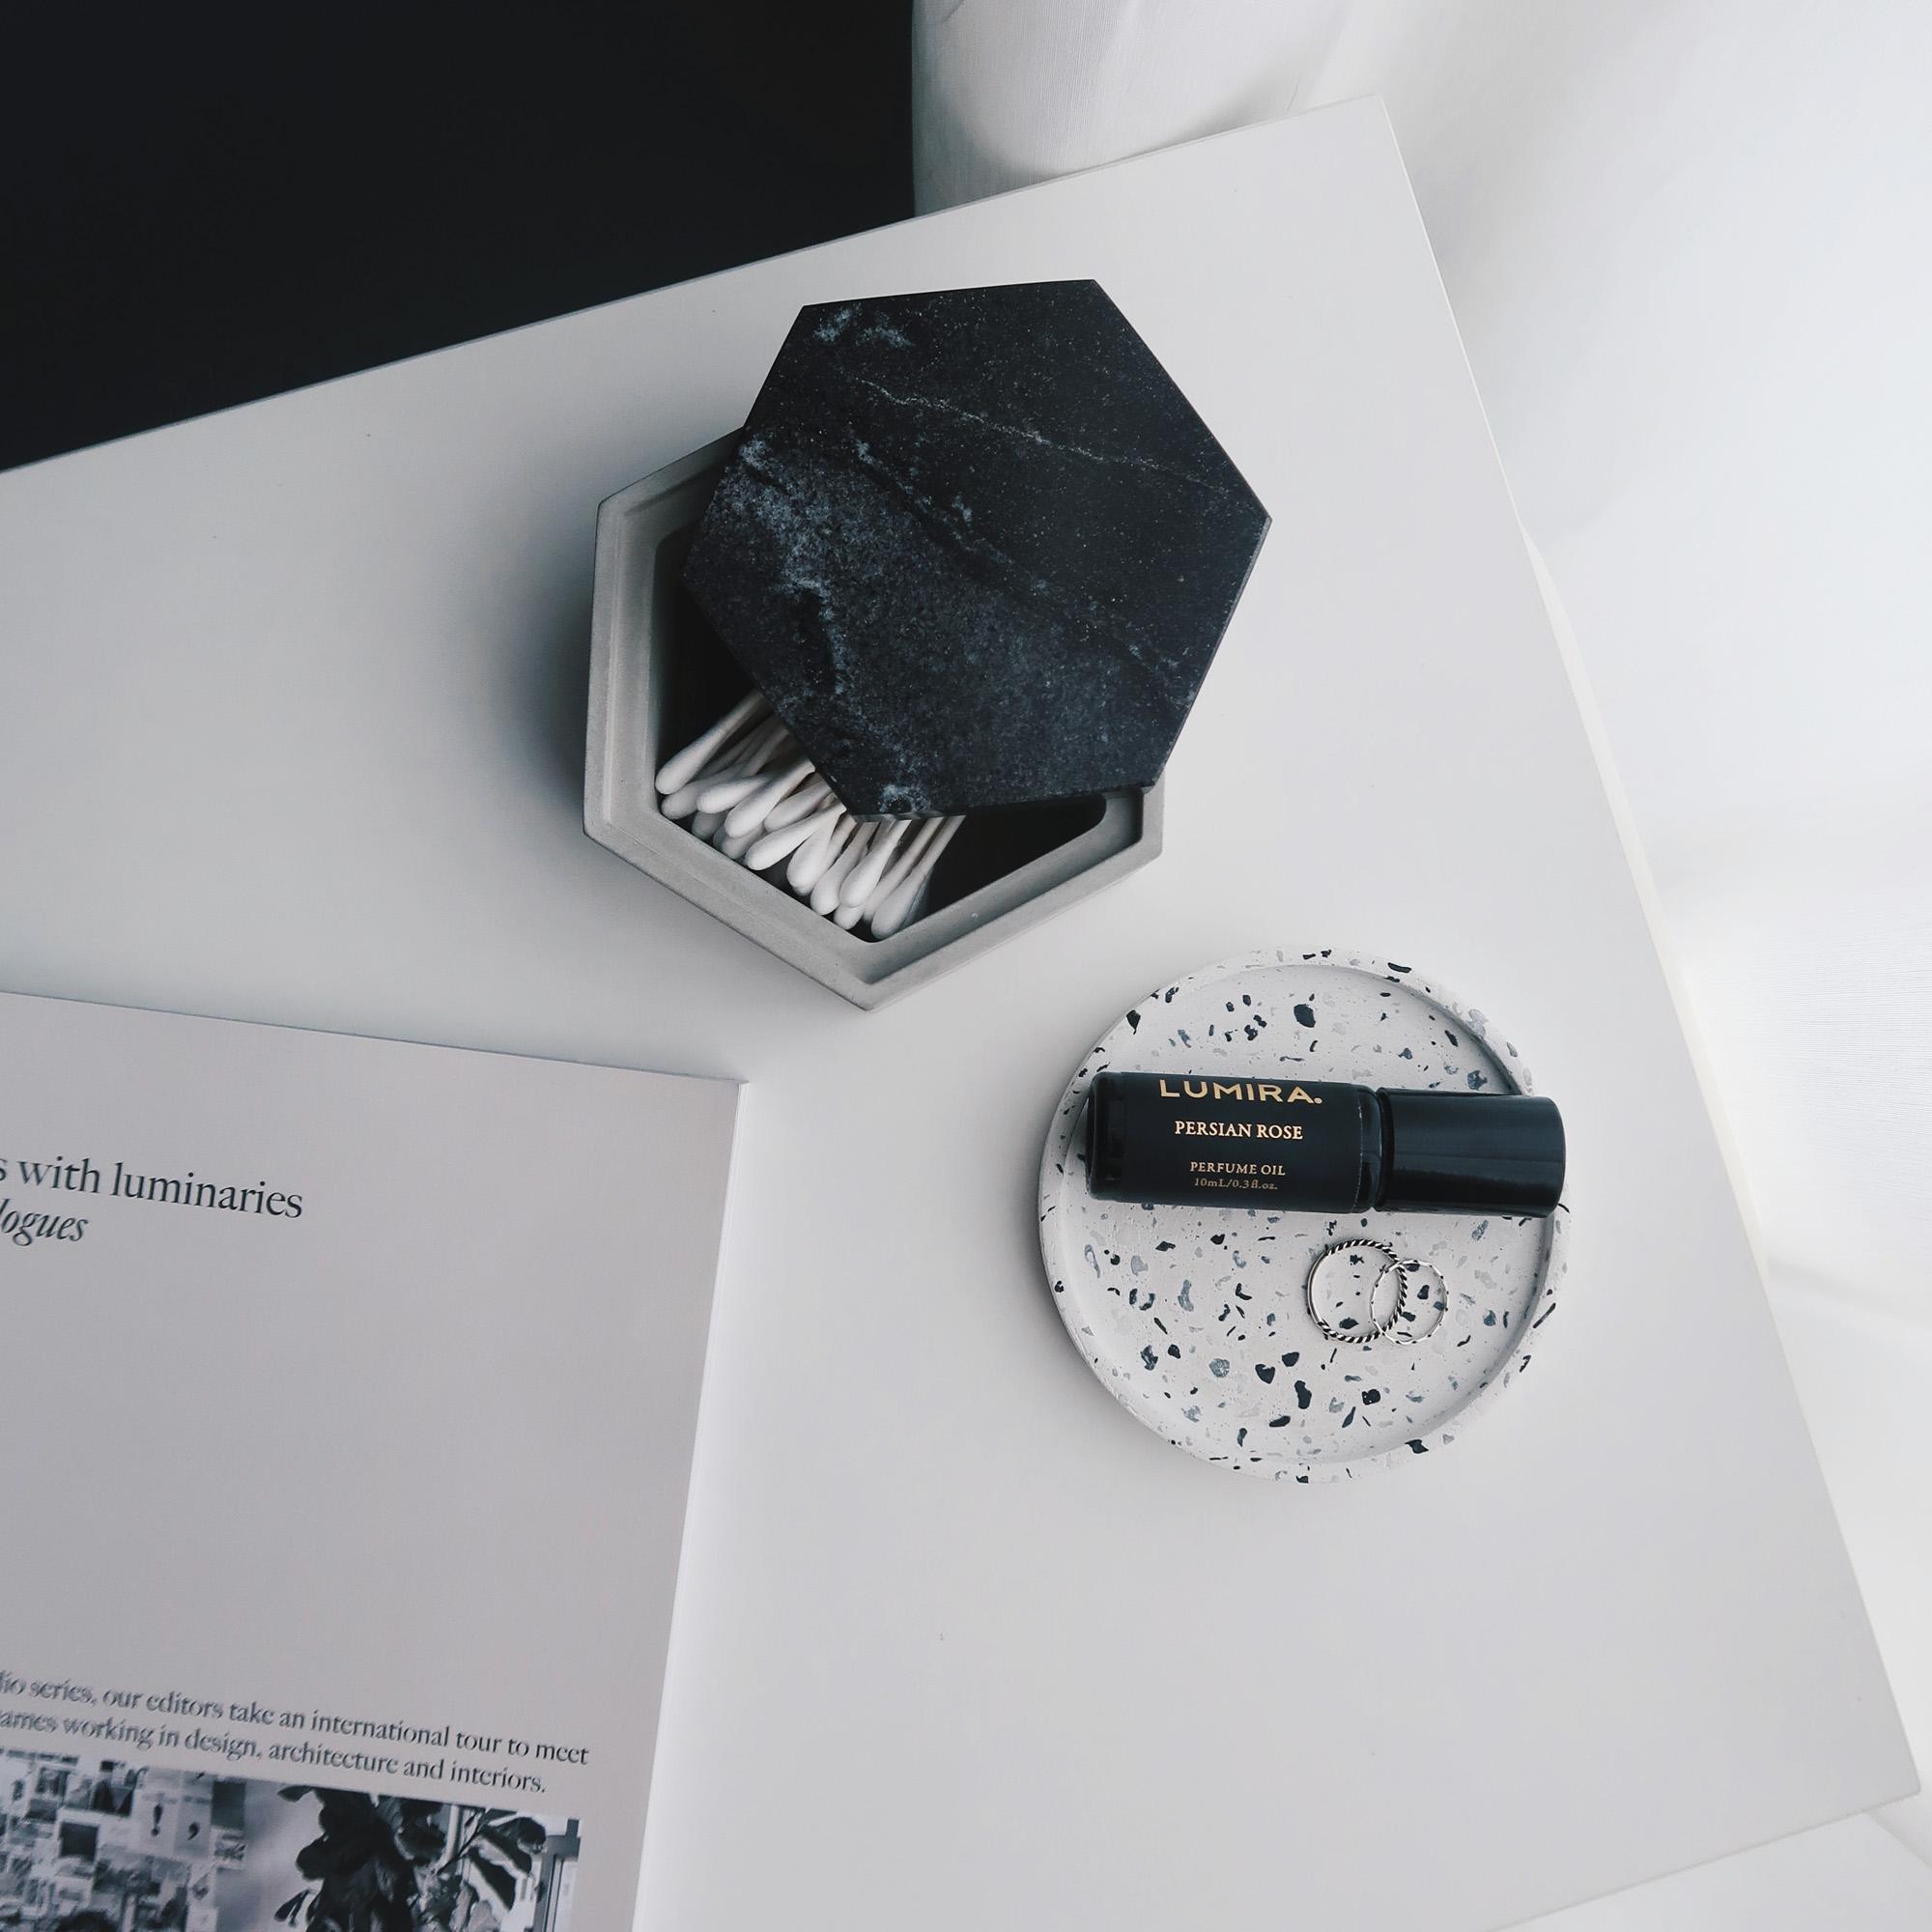 TERRAZZO 磨石子經典黑白水泥杯墊・飾盤・擴香盤